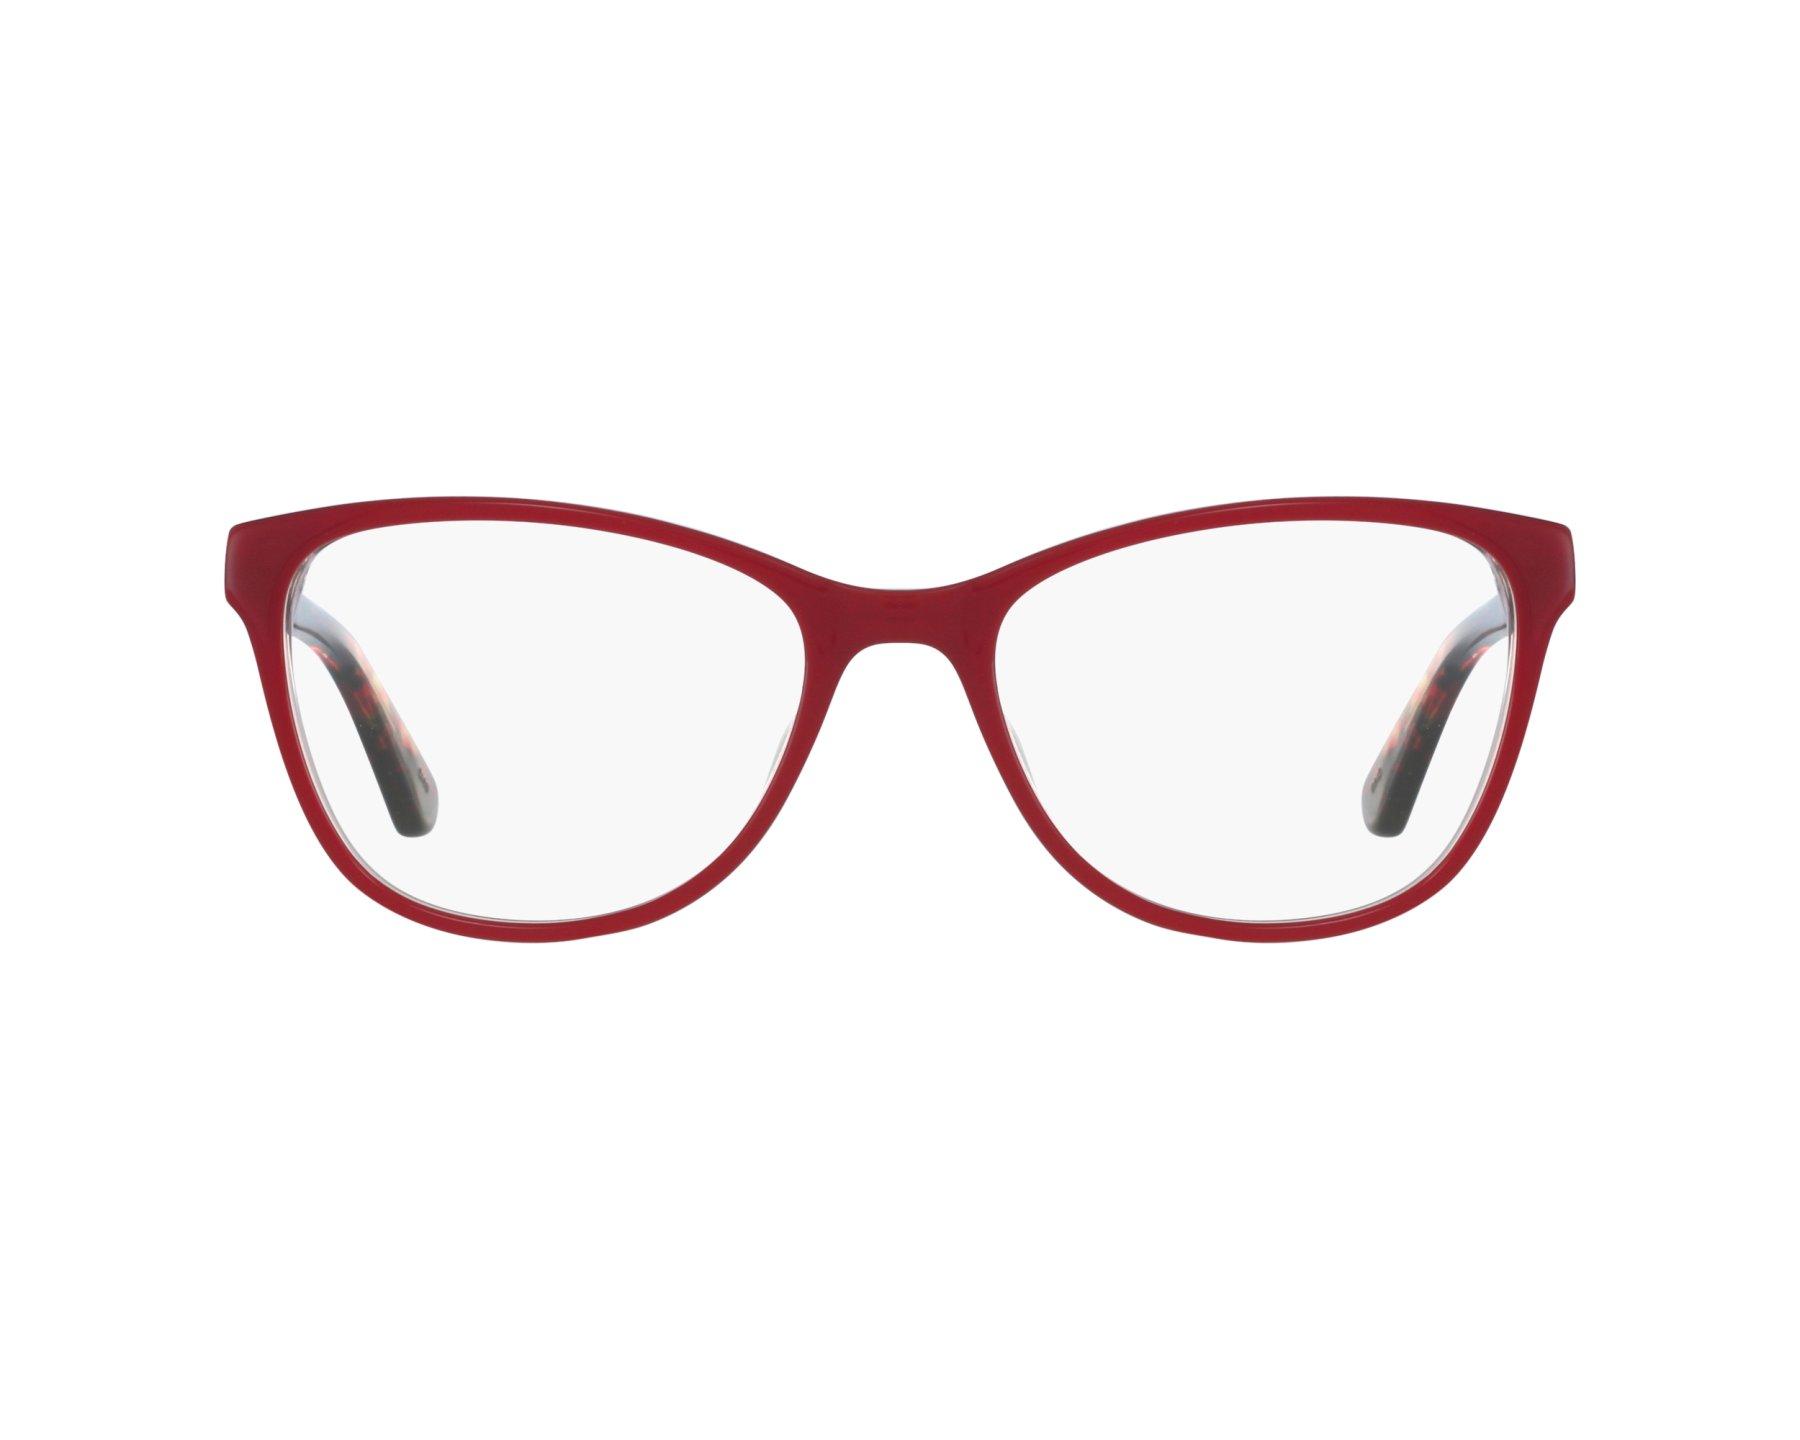 Guess Eyeglasses Red GU-2547 068 - Visionet US